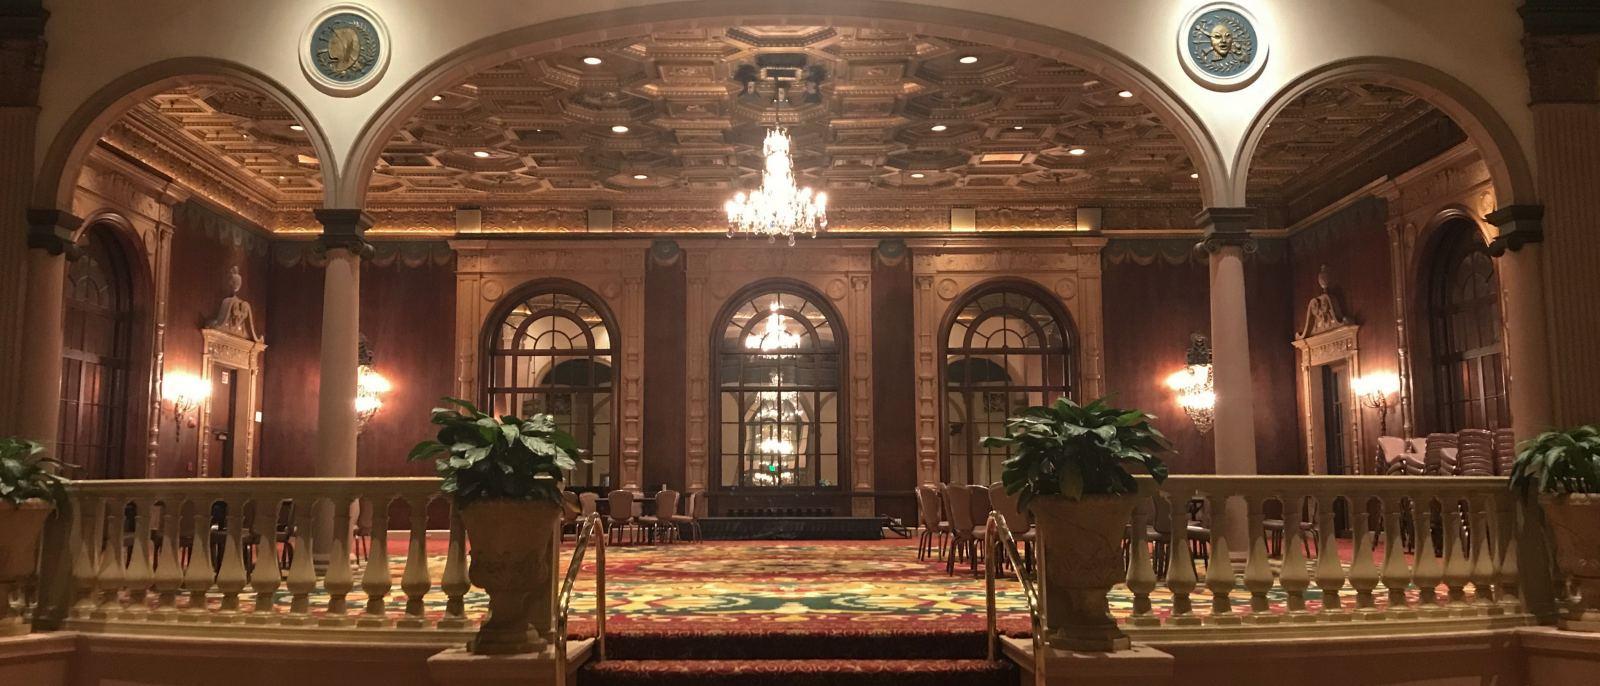 The Gold Room, Millennium Biltmore Hotel   |  Photo: Gustavo Turner